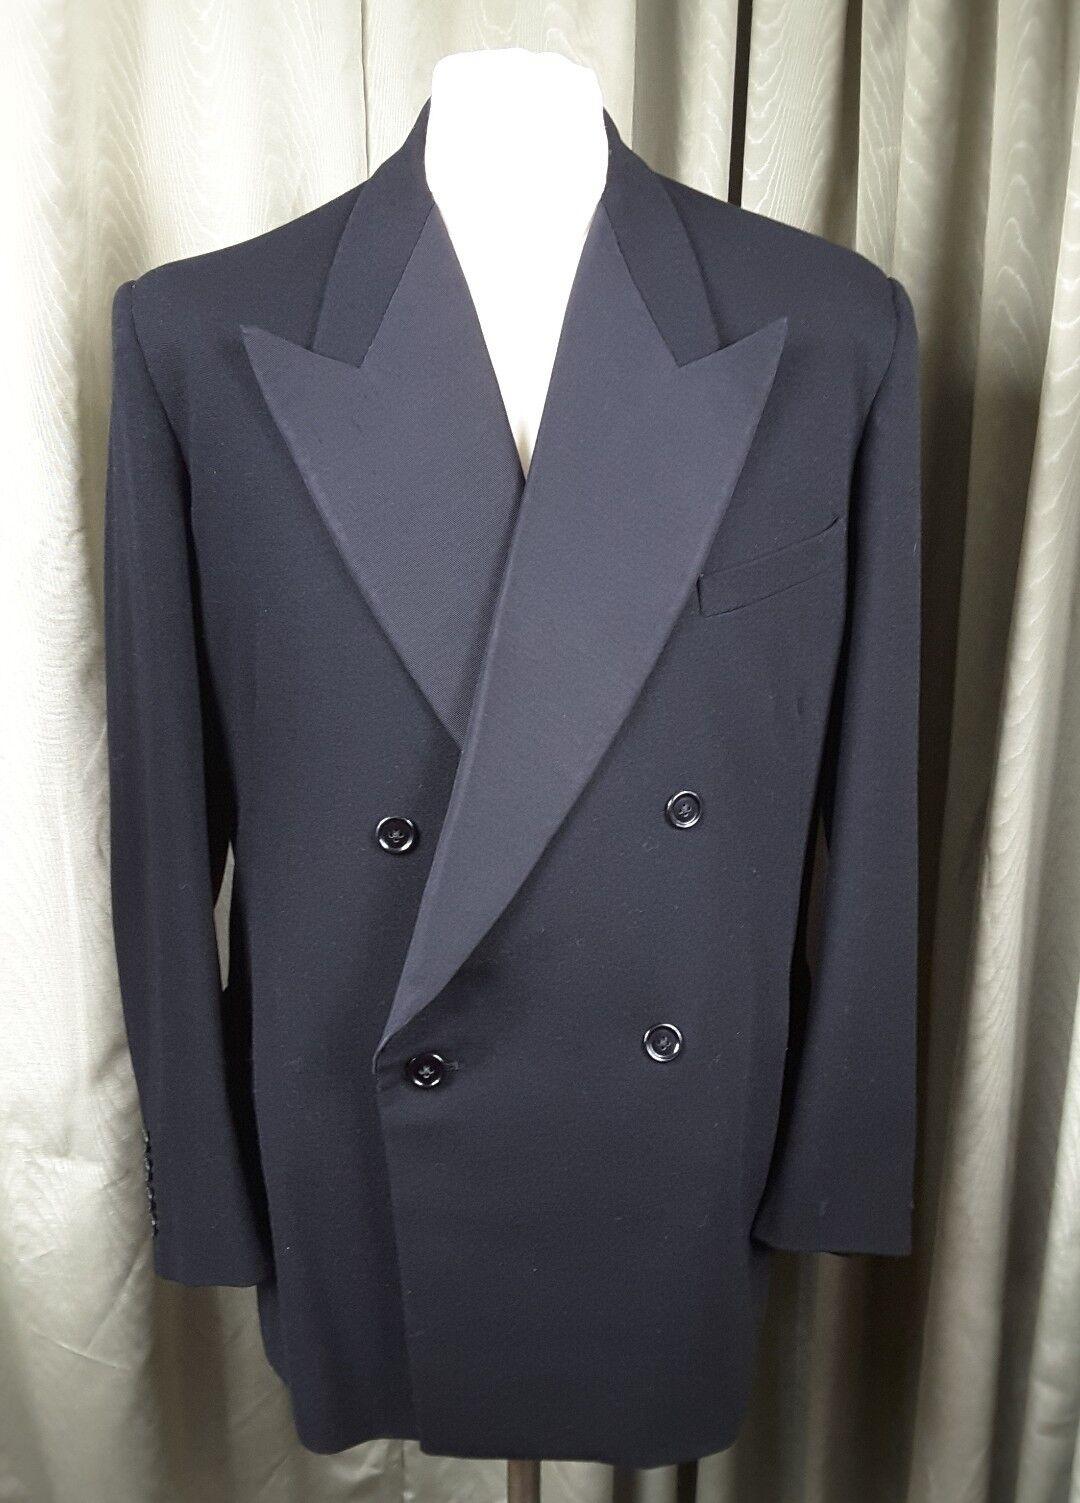 Vintage 50s Bespoke Wool Dinner Evening Black Jacket 38-40